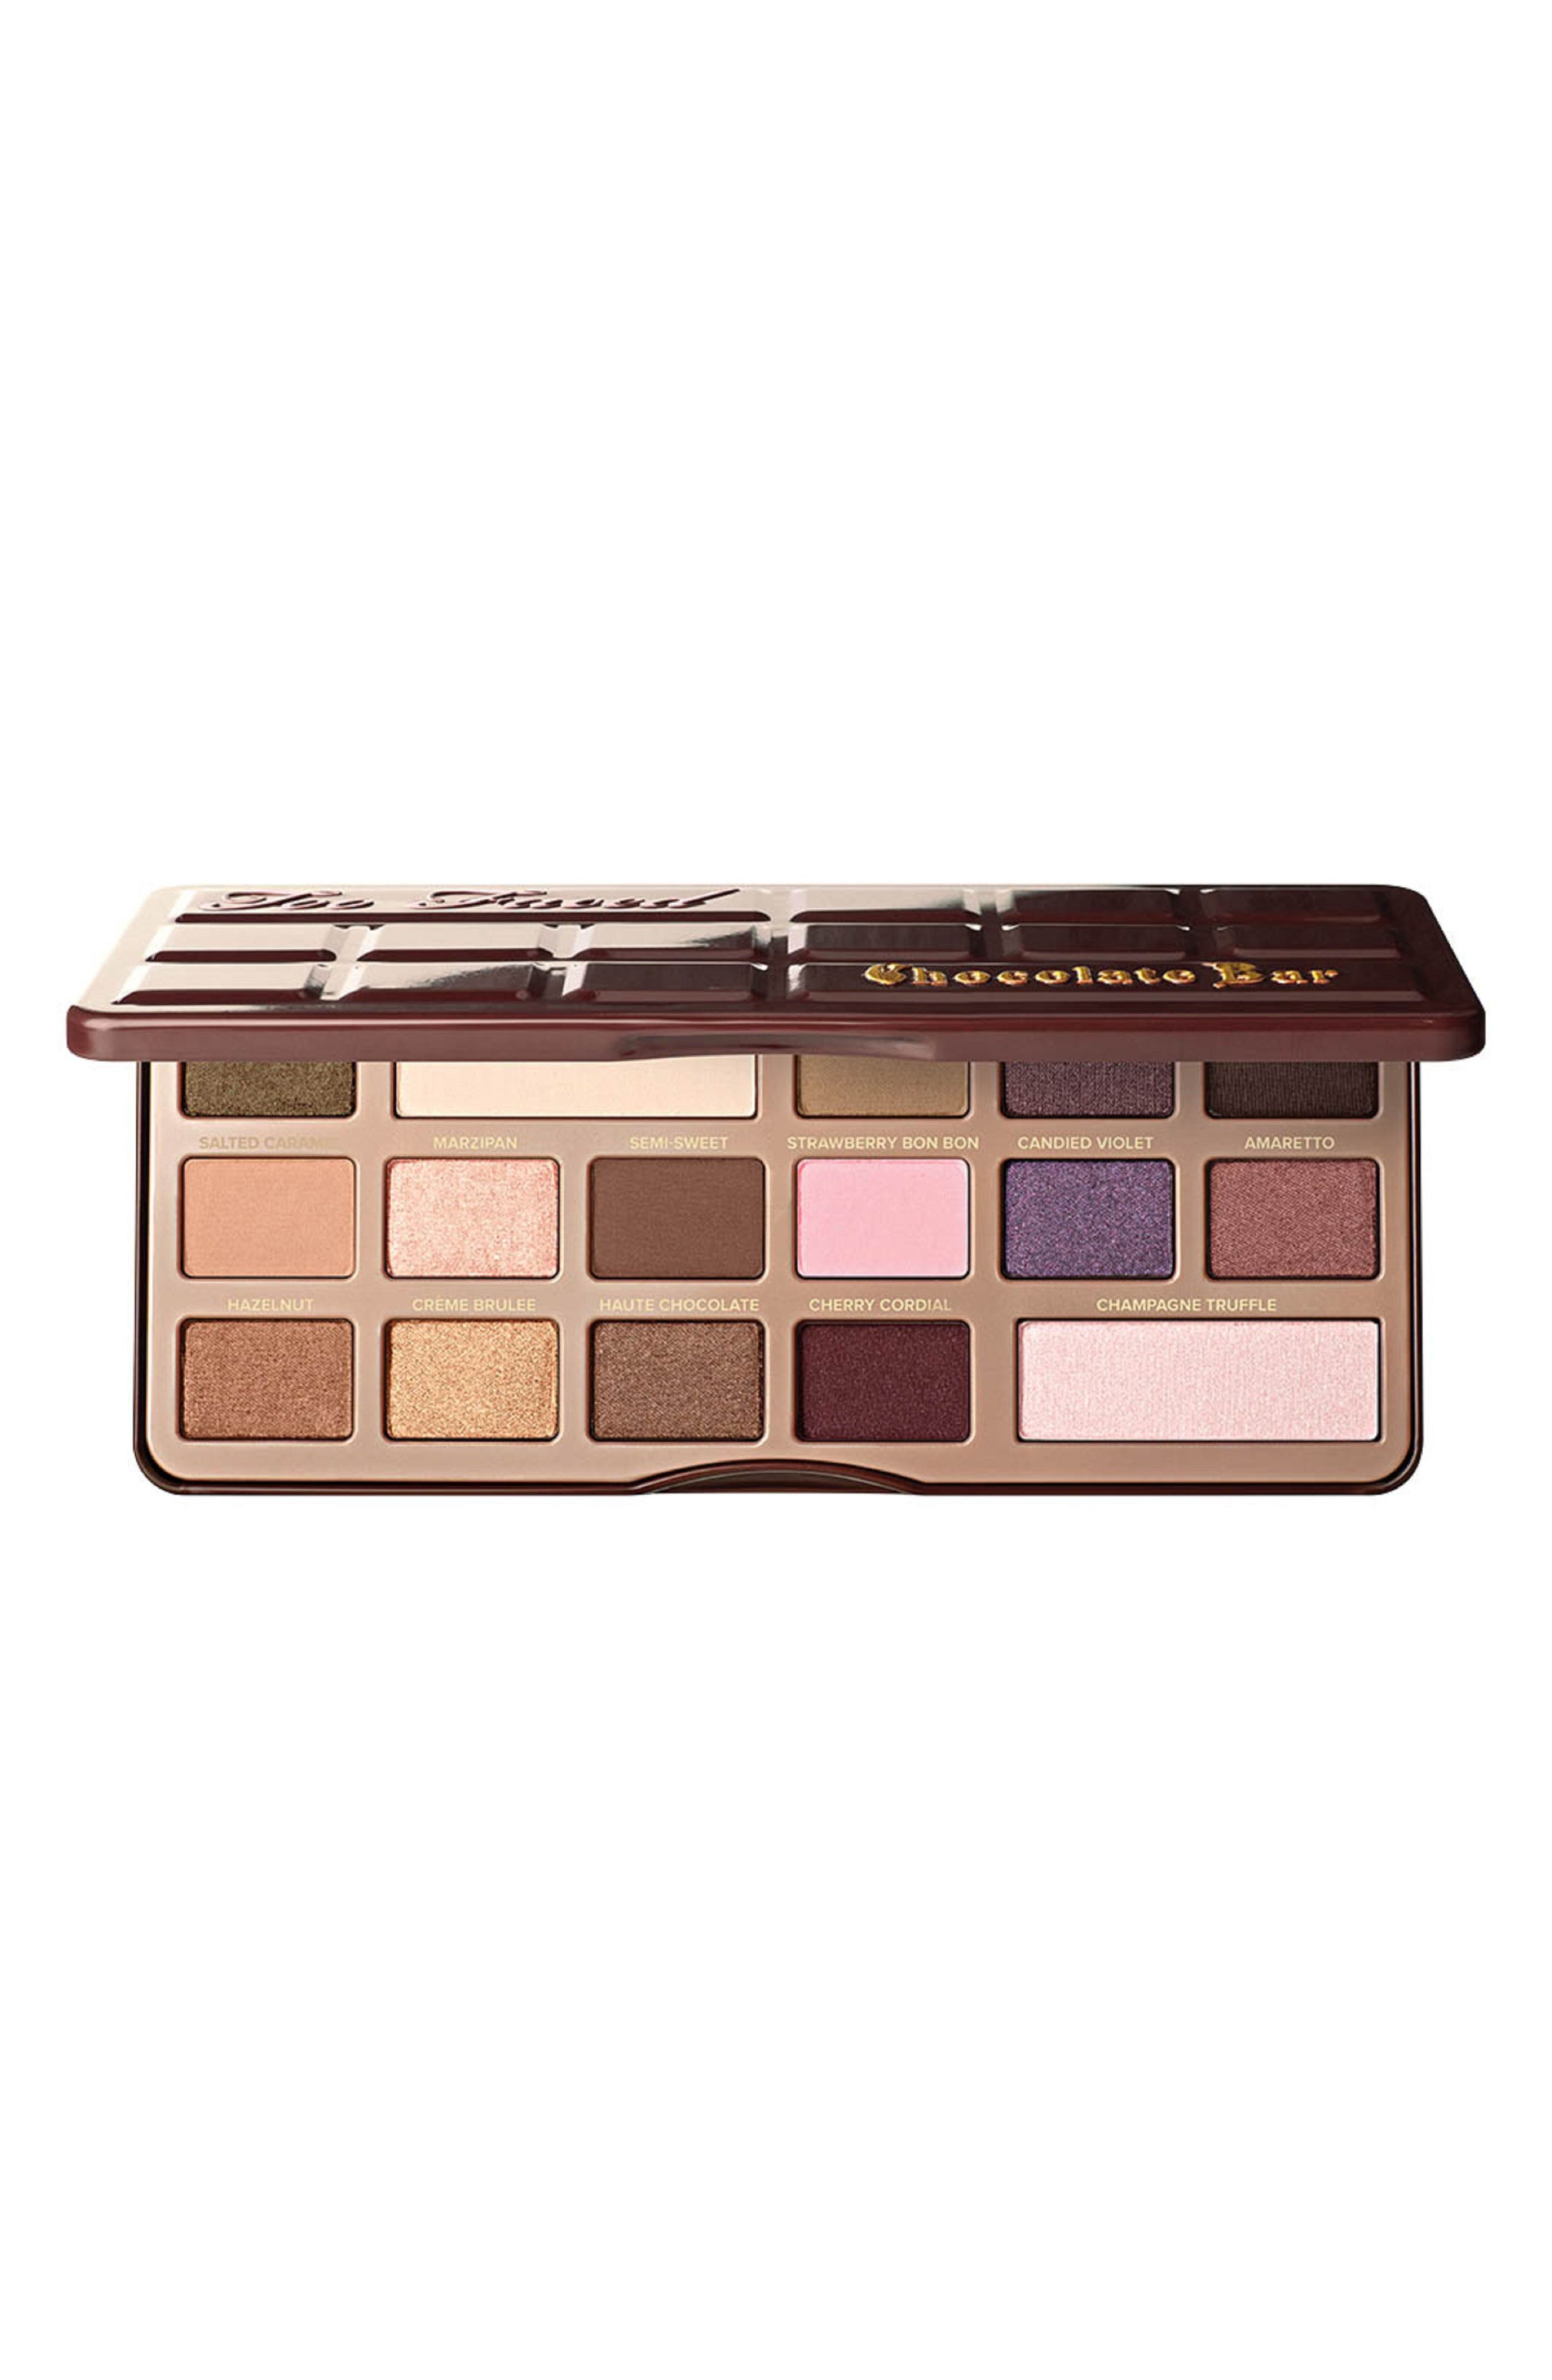 Chocolate Bar Eyeshadow Palette,                             Main thumbnail 1, color,                             No Color